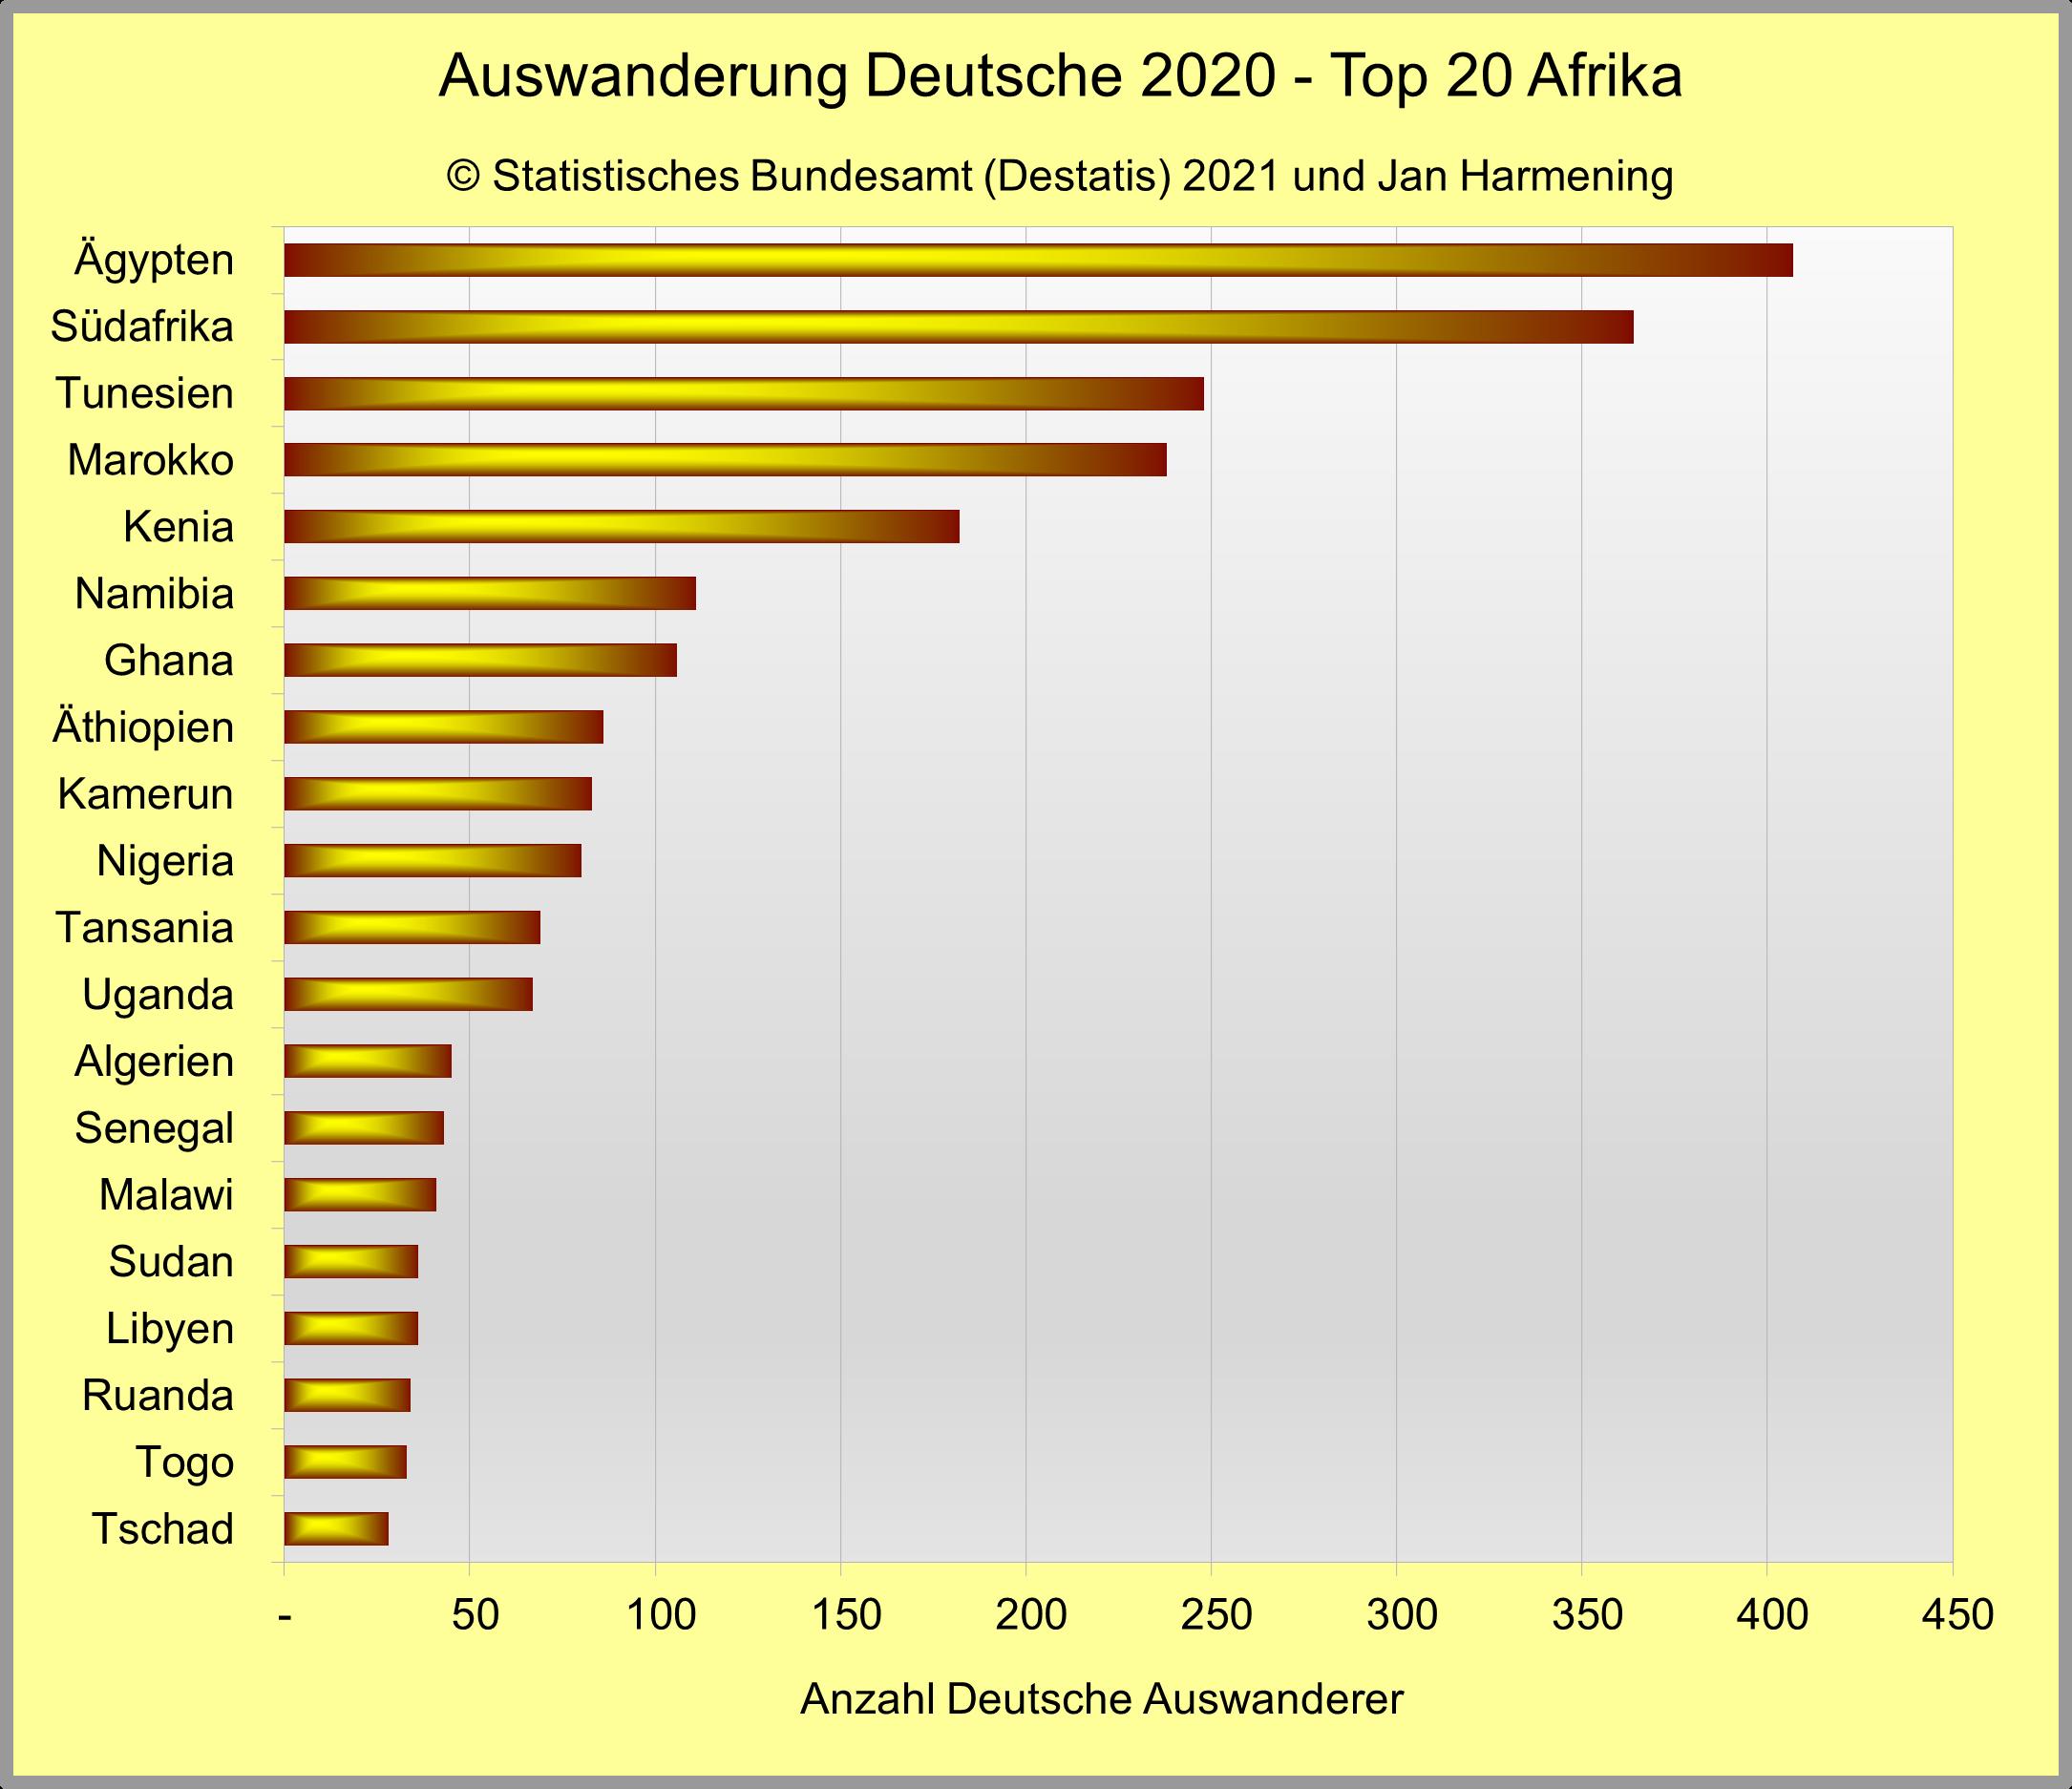 Auswanderung Deutsche 2020 - Top 20 Afrika